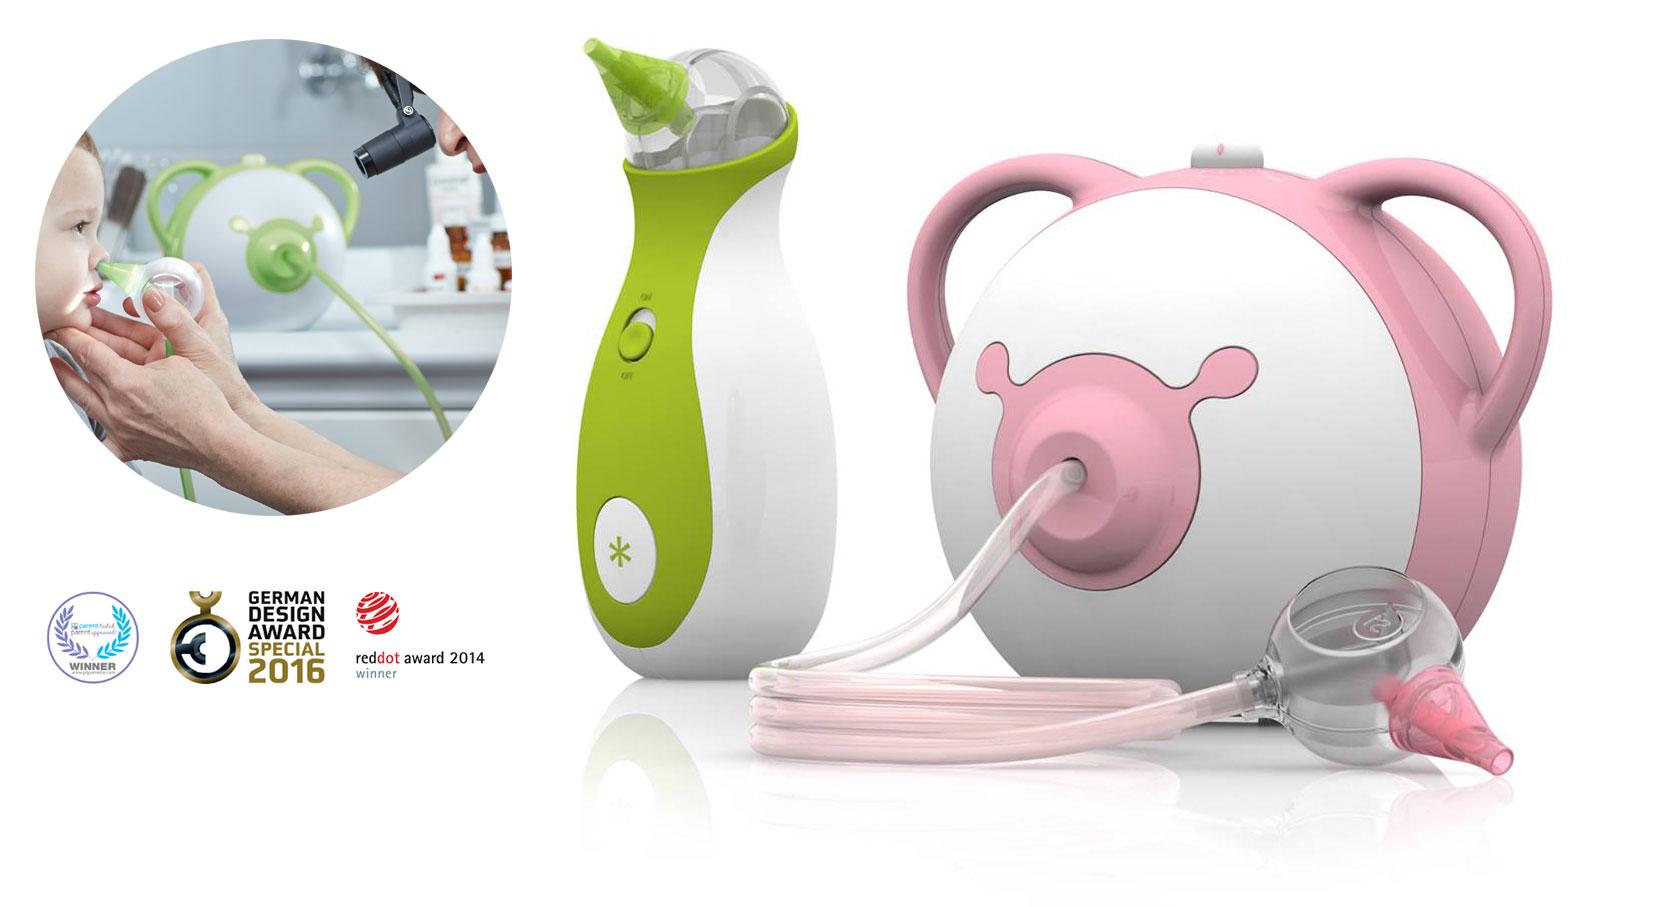 elektryczny aspirator dla dziecka do nosa profesjonalny medyczny nosiboo pro 3kiwi